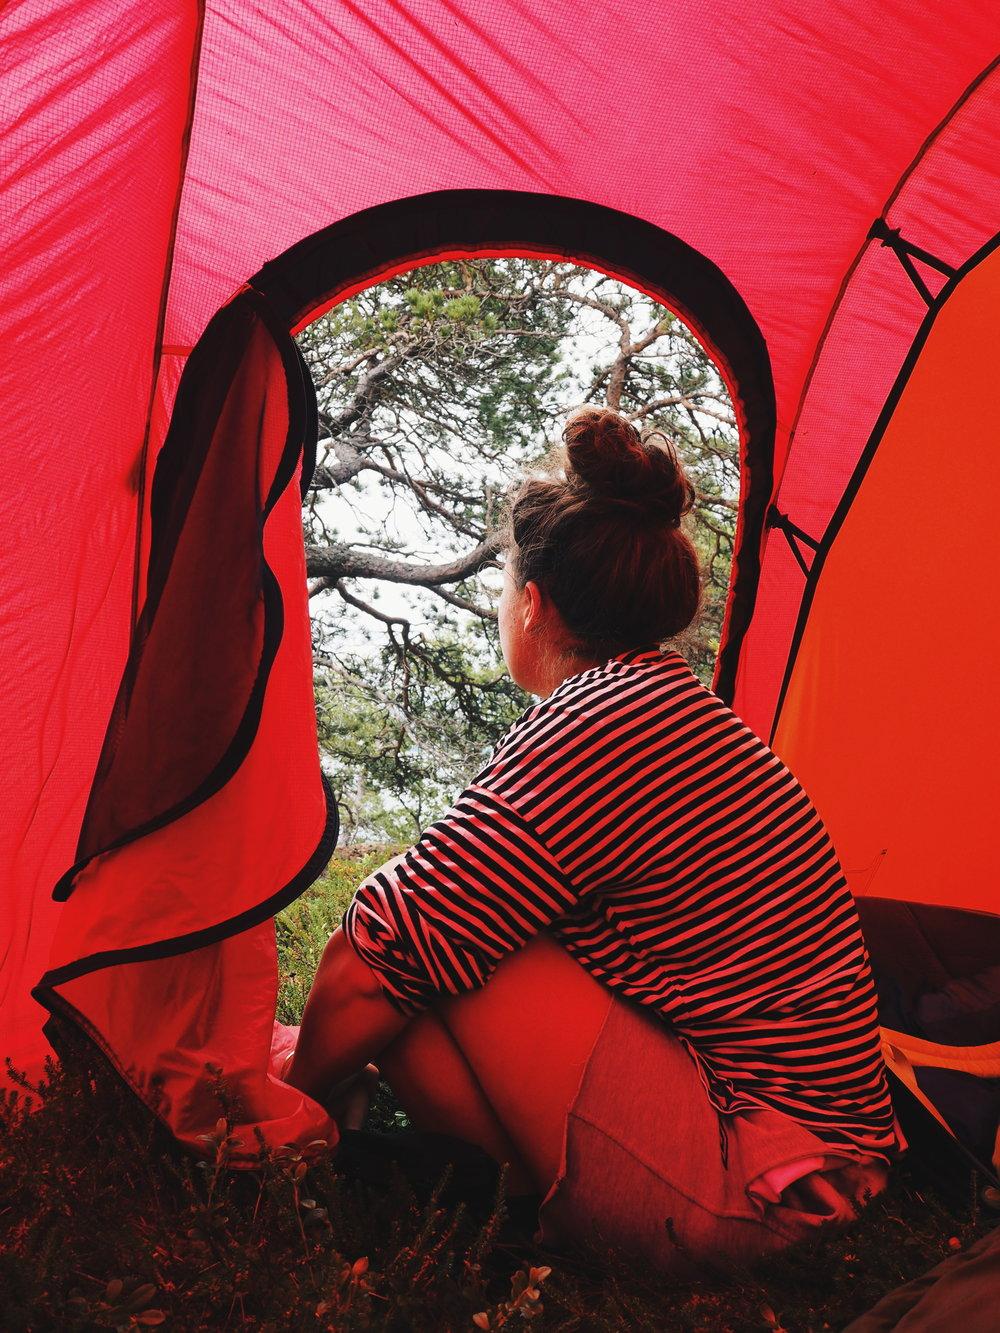 camping-tent-girl-pauliinaskarr